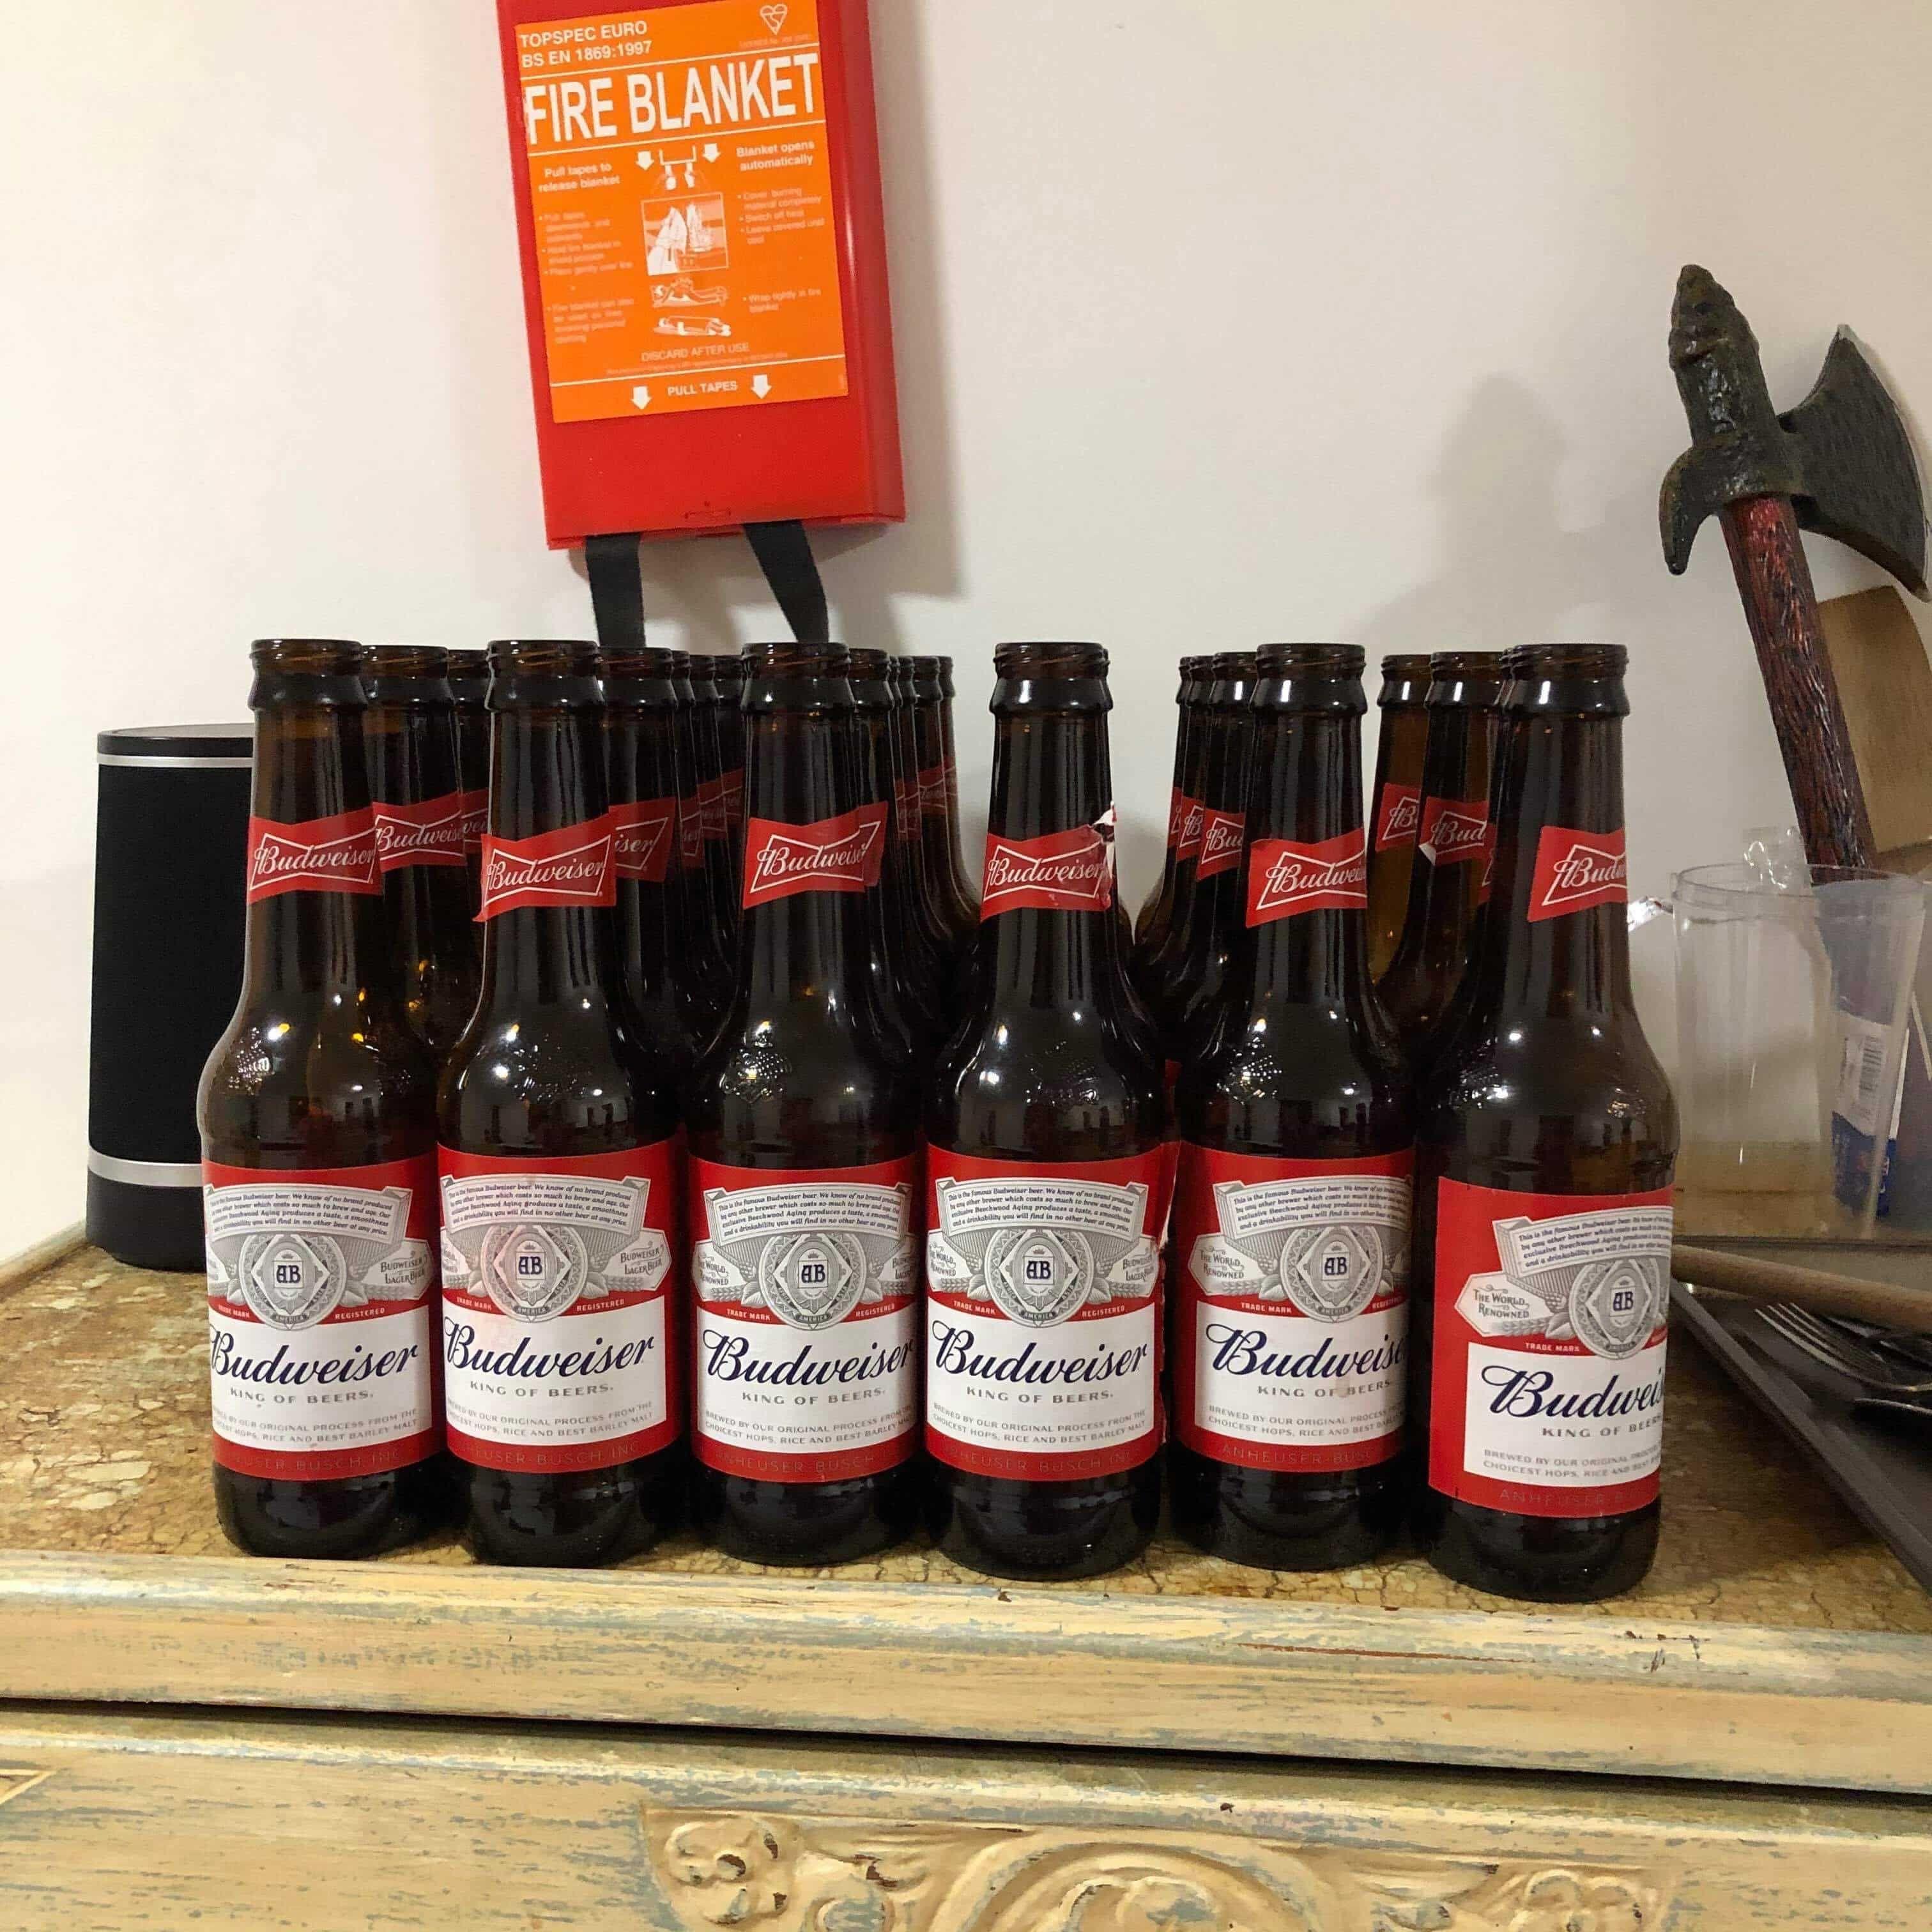 Image may contain: Beer Bottle, Bottle, Beer, Drink, Beverage, Alcohol